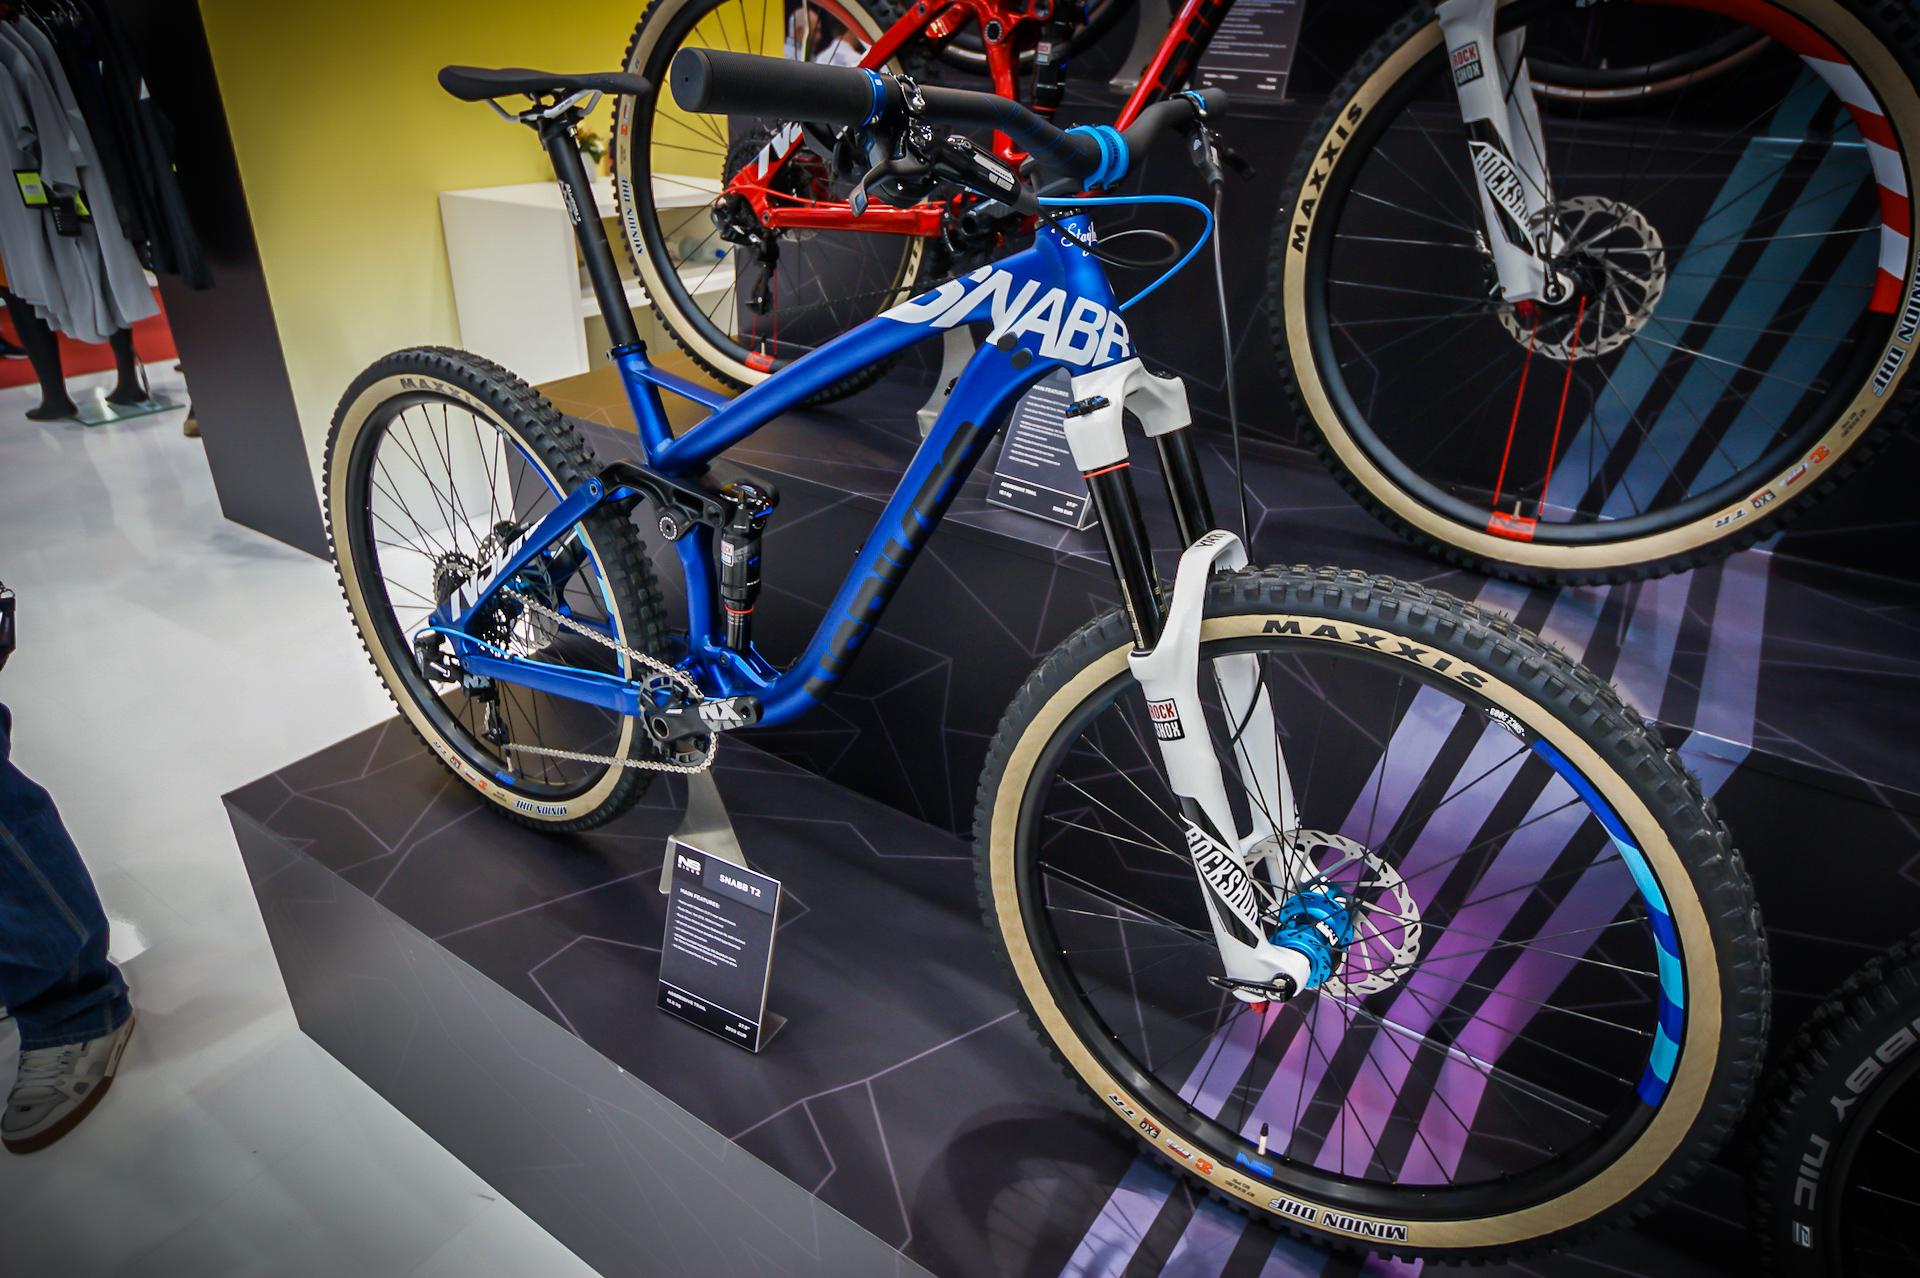 Kolejna cudna maszyna - NS Bikes Snabb T2.